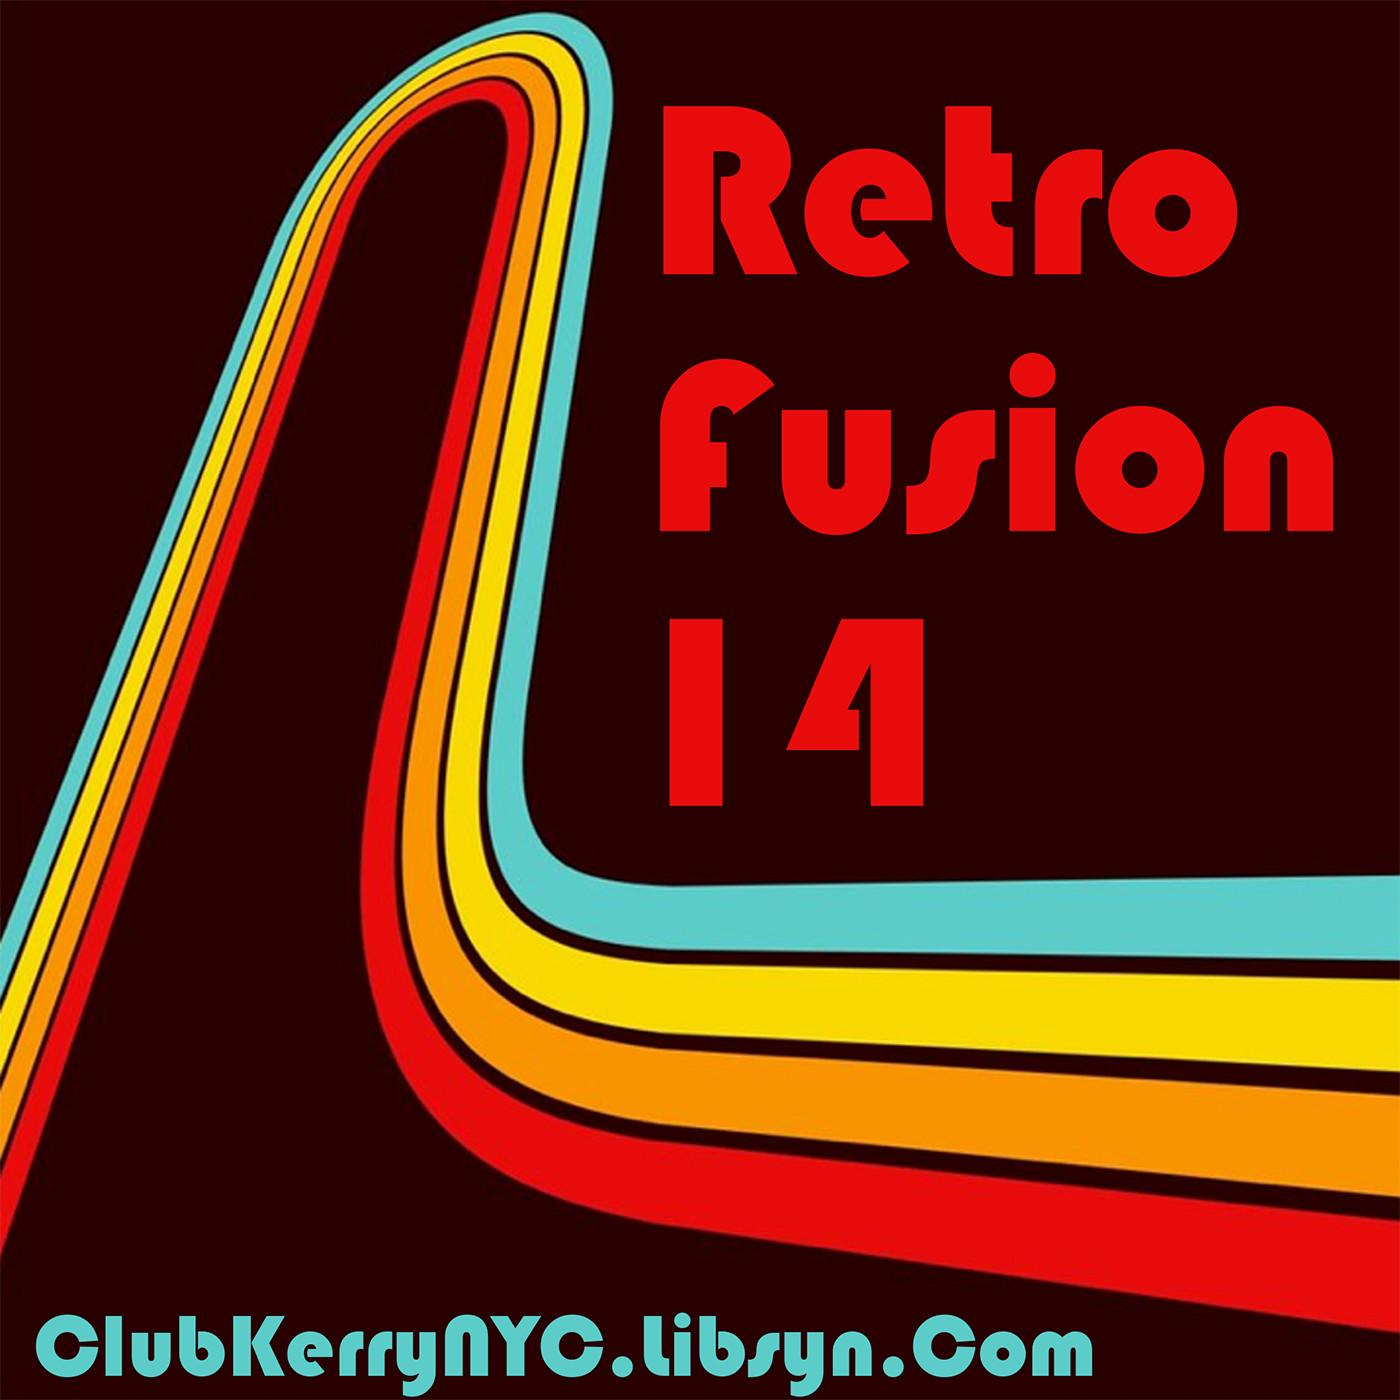 Retro Fusion 14 (Vocal House, Dance, Deep House, Melodic House) - DJ Kerry John Poynter show art